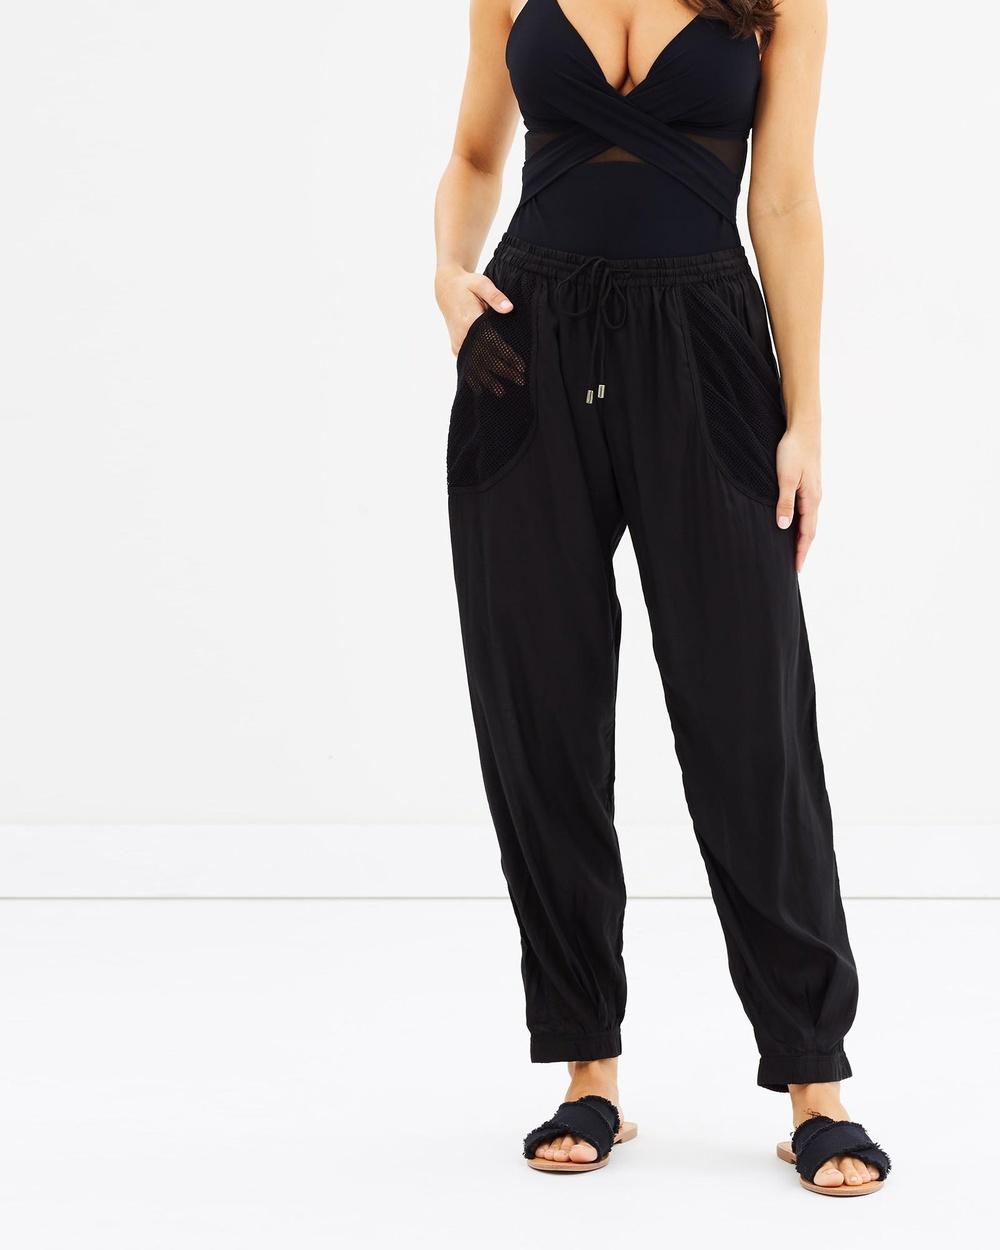 JETS Slim Leg Pants Swimwear Black Slim-Leg Pants